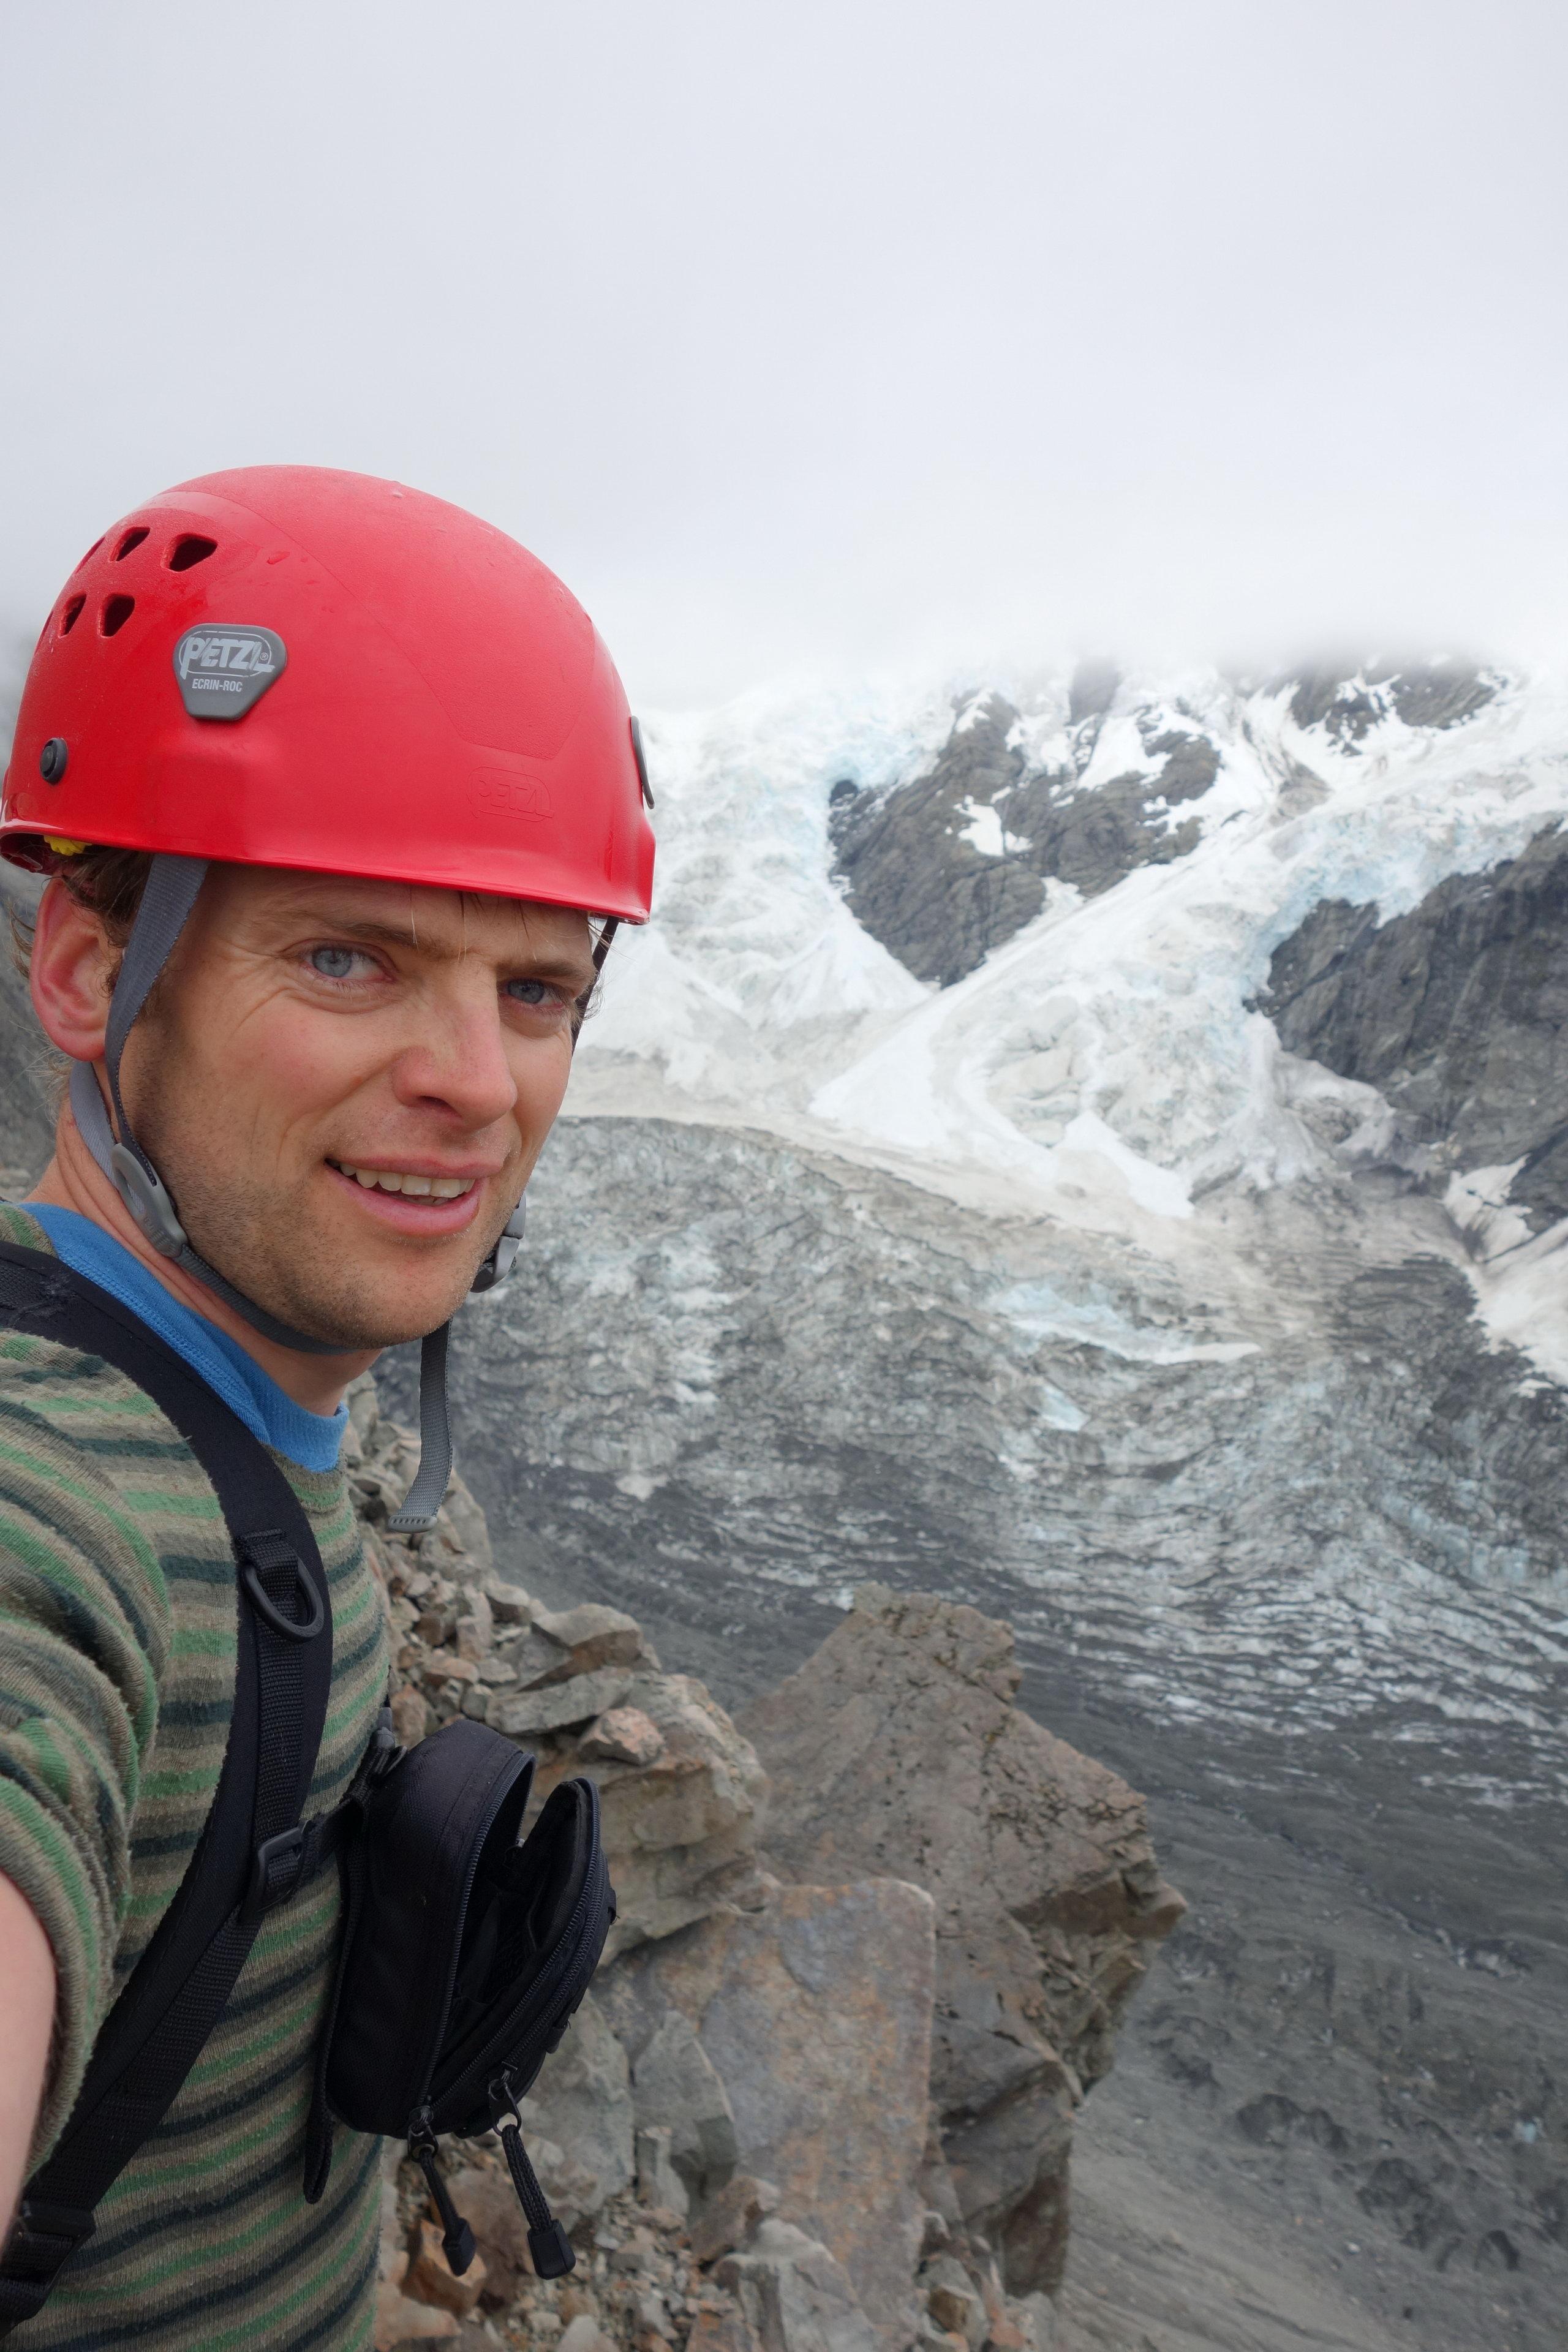 Cris with Caroline Glacier behind (Ball Pass Dec 2013)